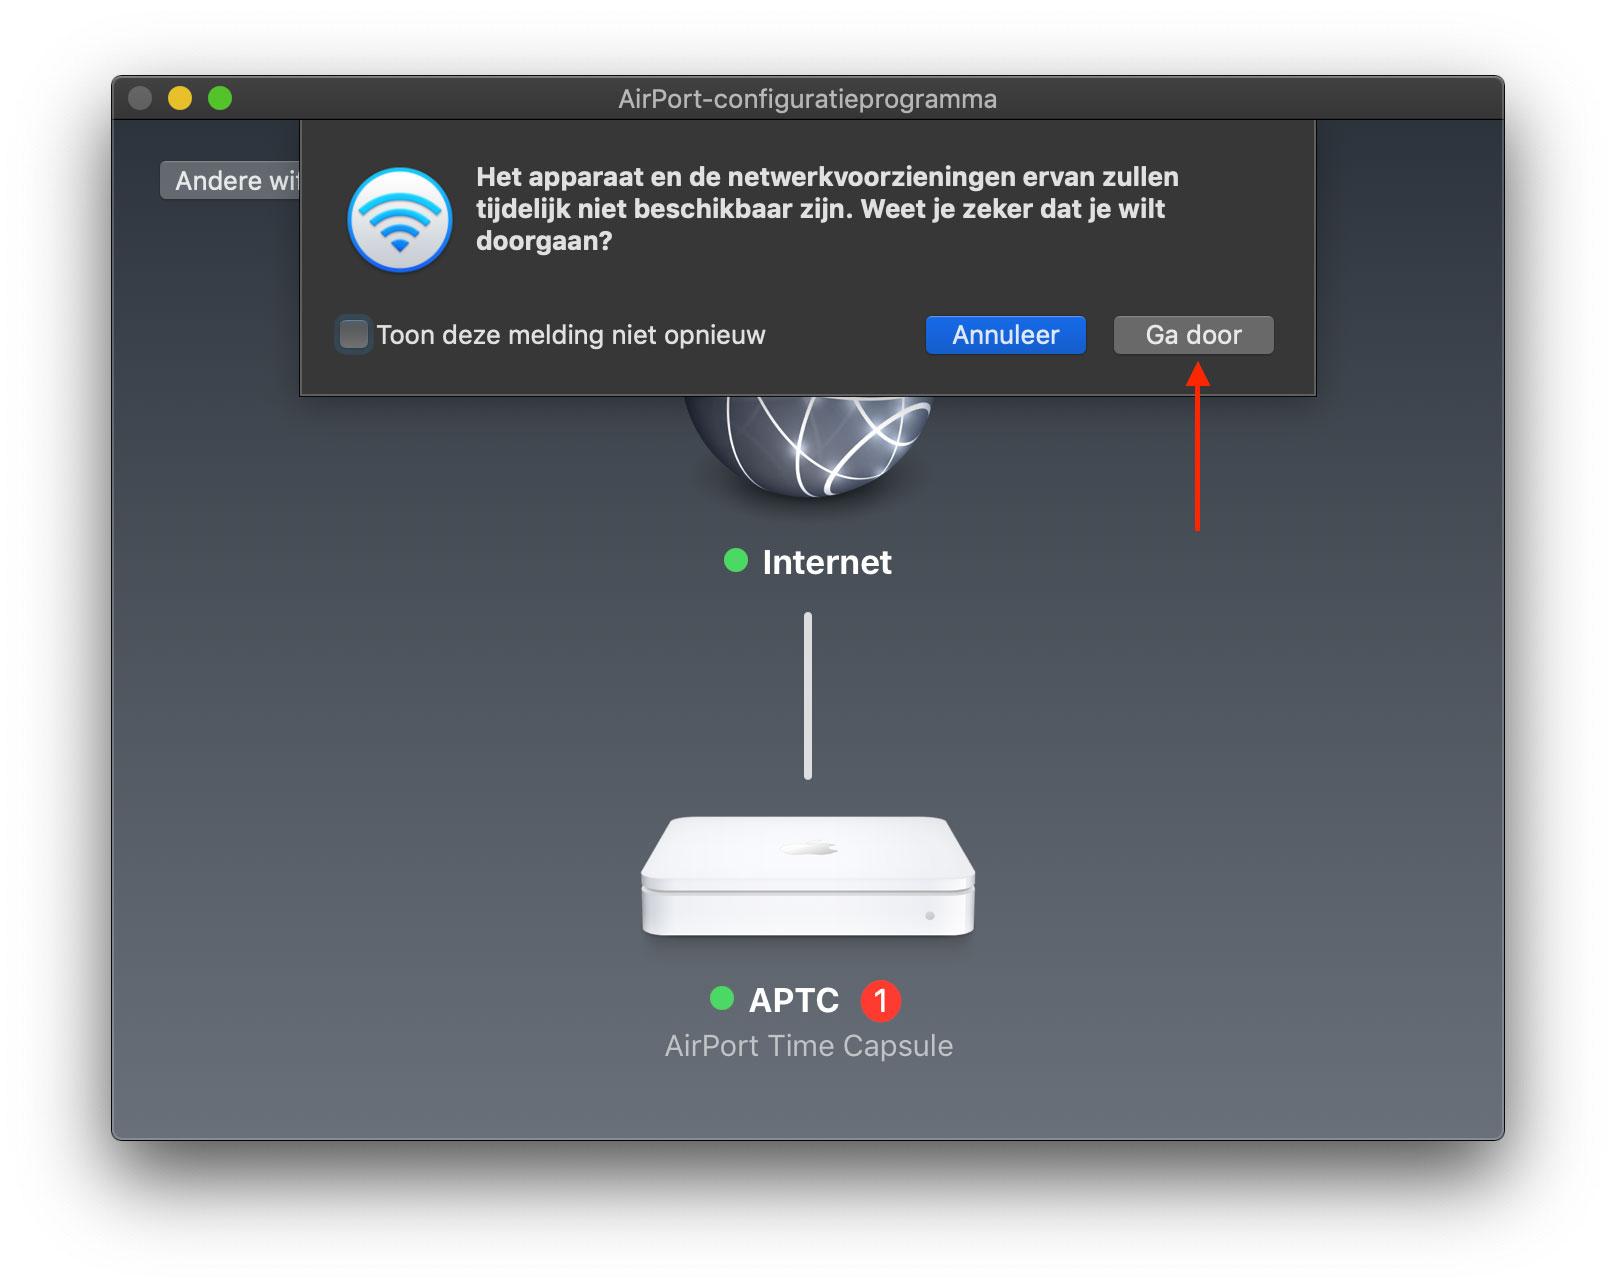 https://www.macfreak.nl/modules/news/images/zArt.AirPortBaseStationFirmwareUpdate7.8.1-3.jpg